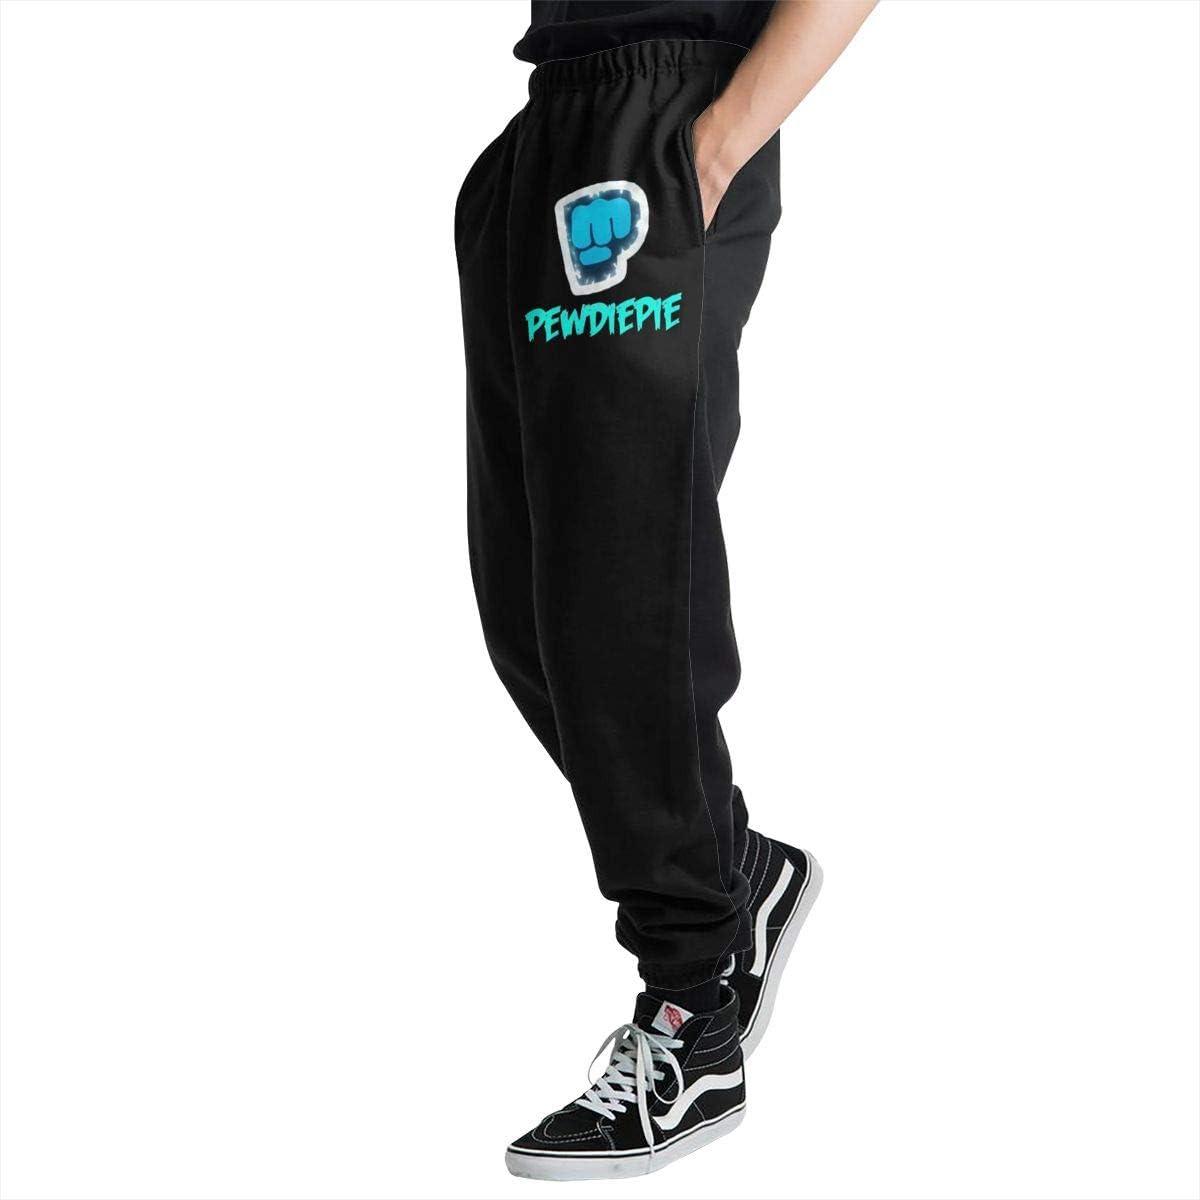 Darkfacai Man Sweatpants Pewdiepie Comfortable Training Pants Long Jogger Pant